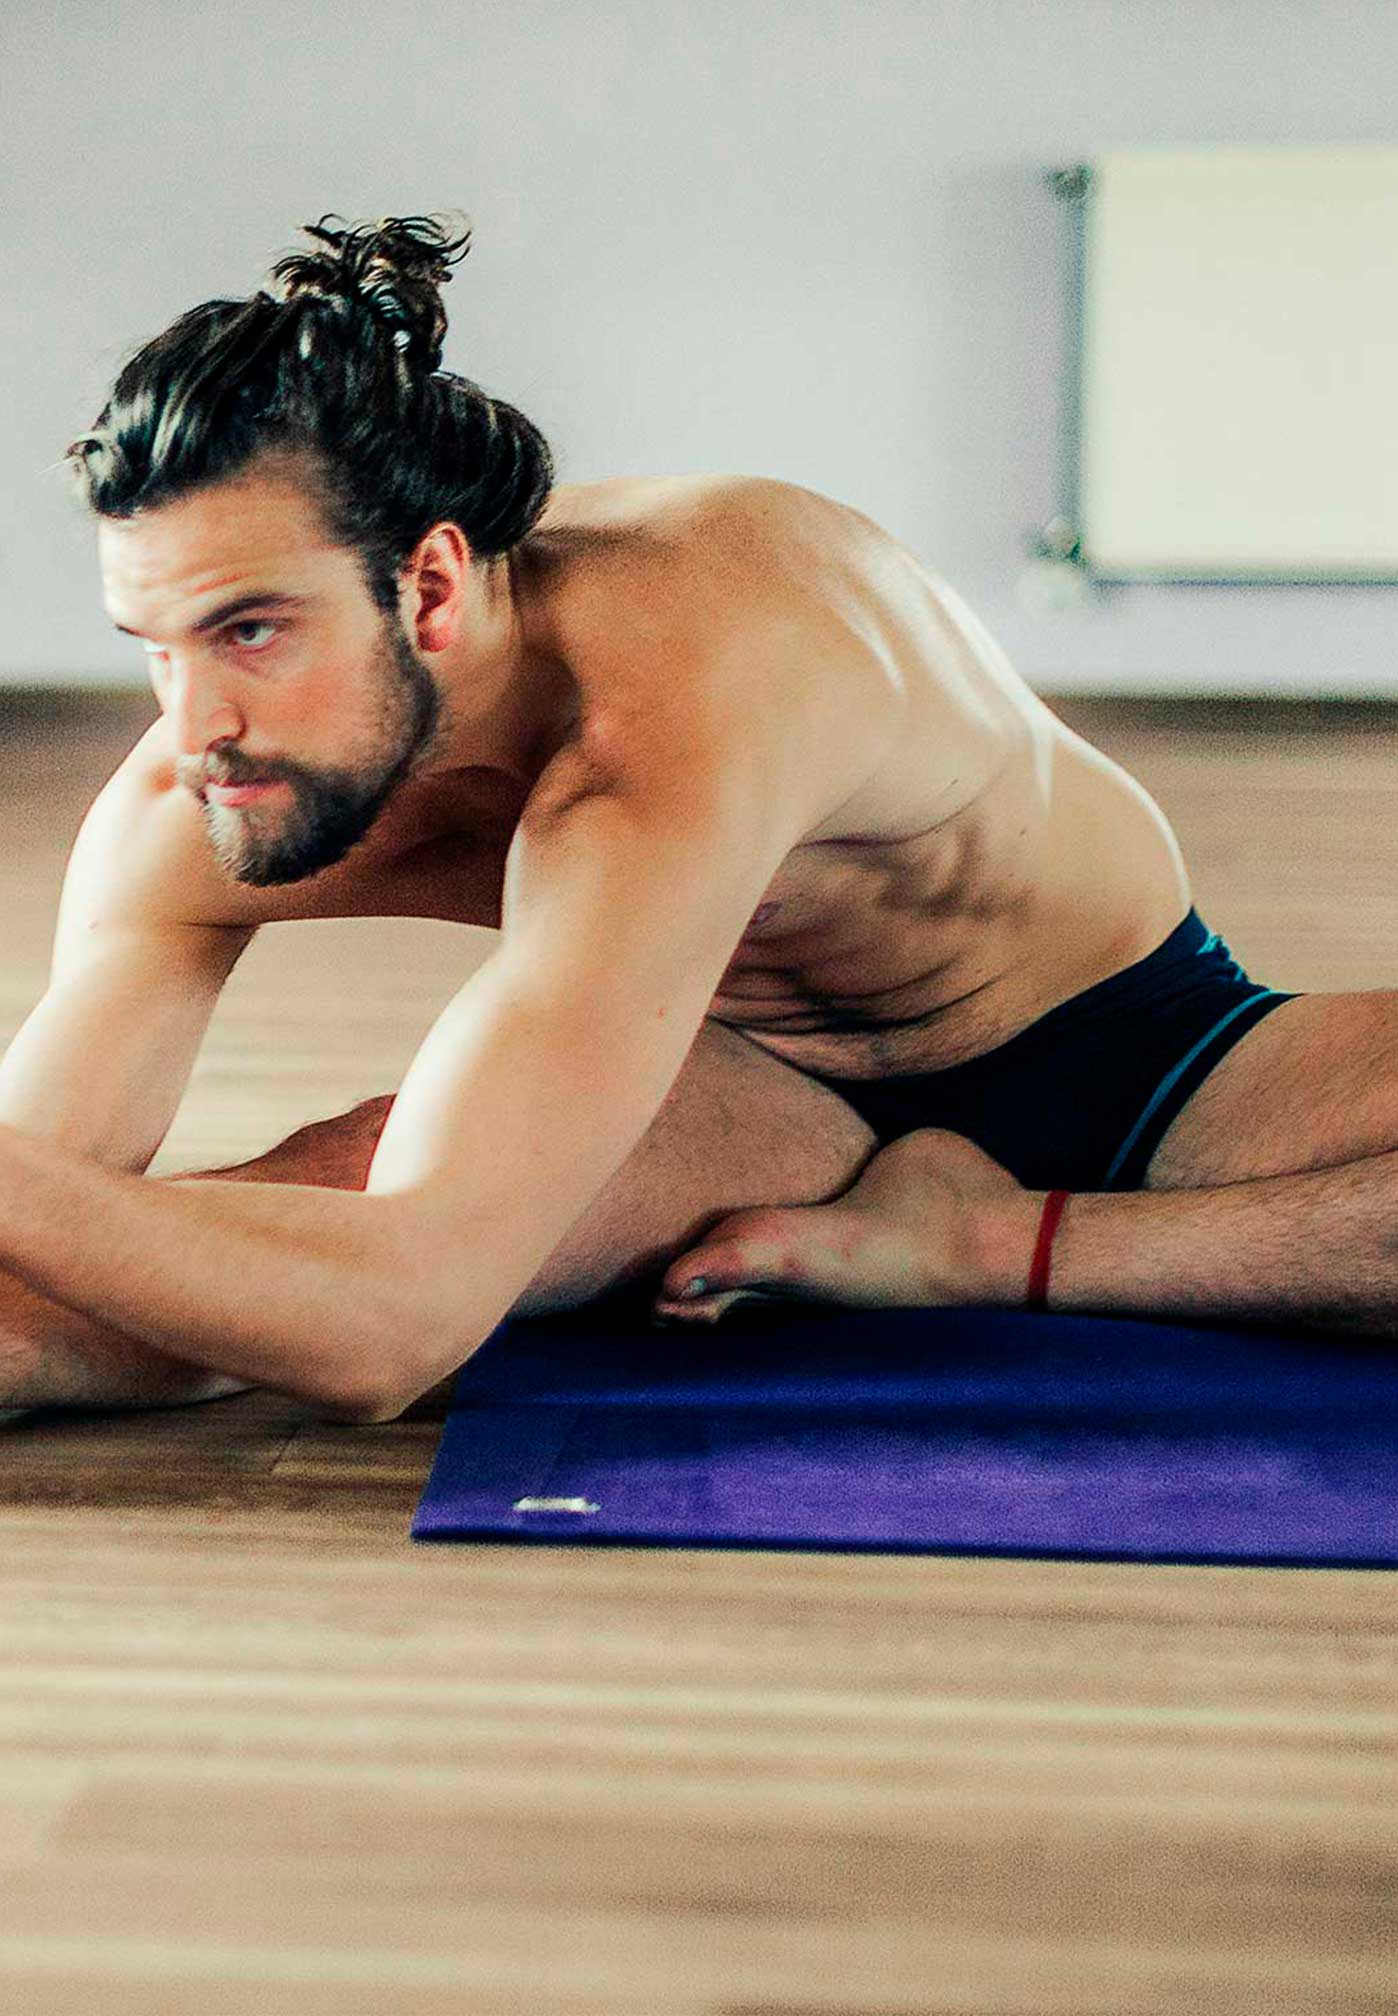 Hombre practicando bikram yoga